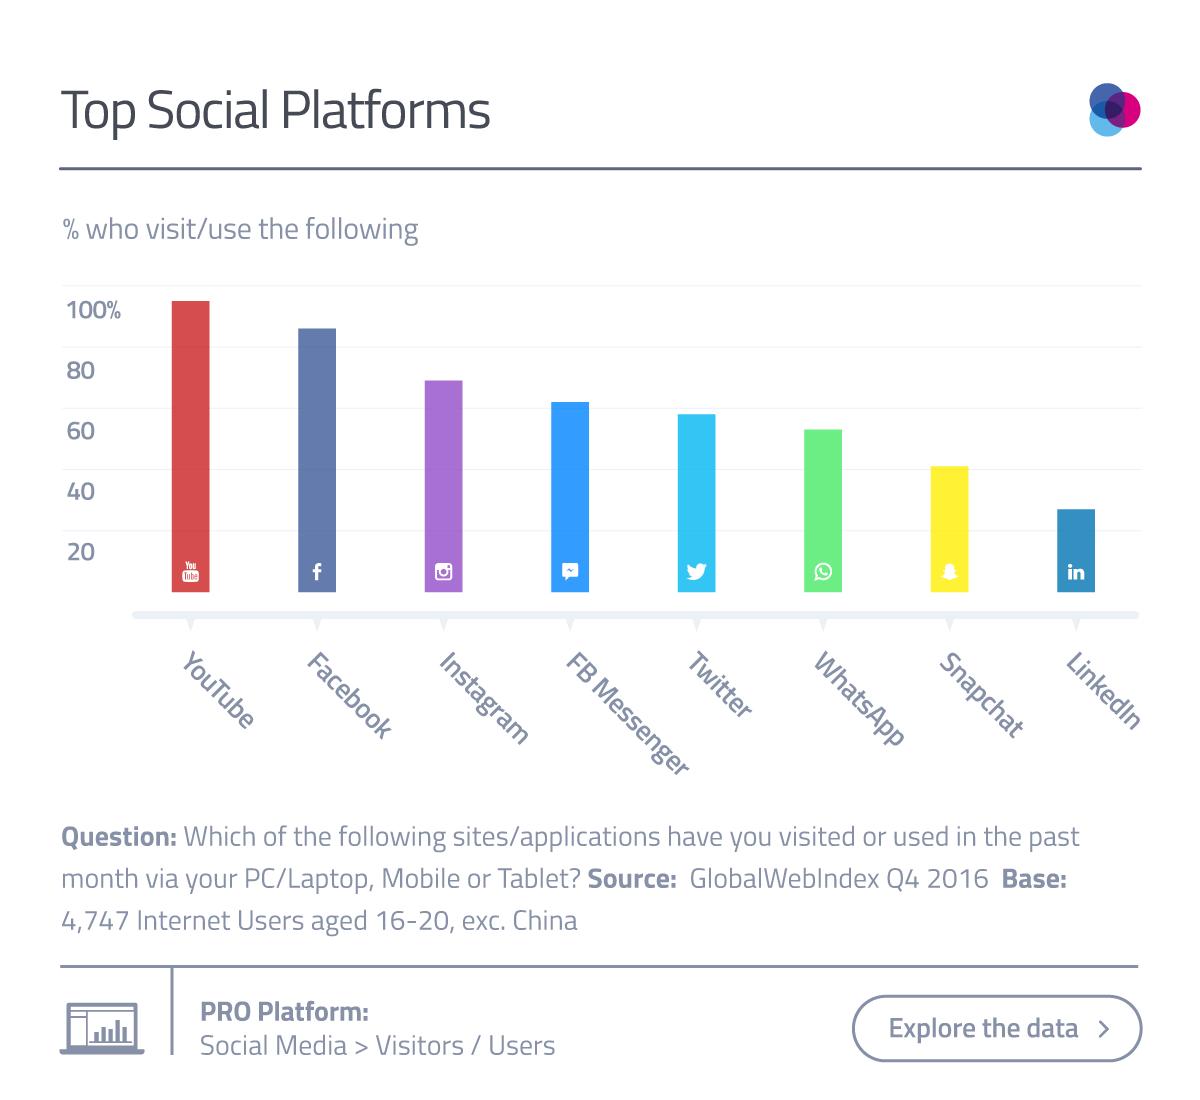 What Is Next Gen Social Network?